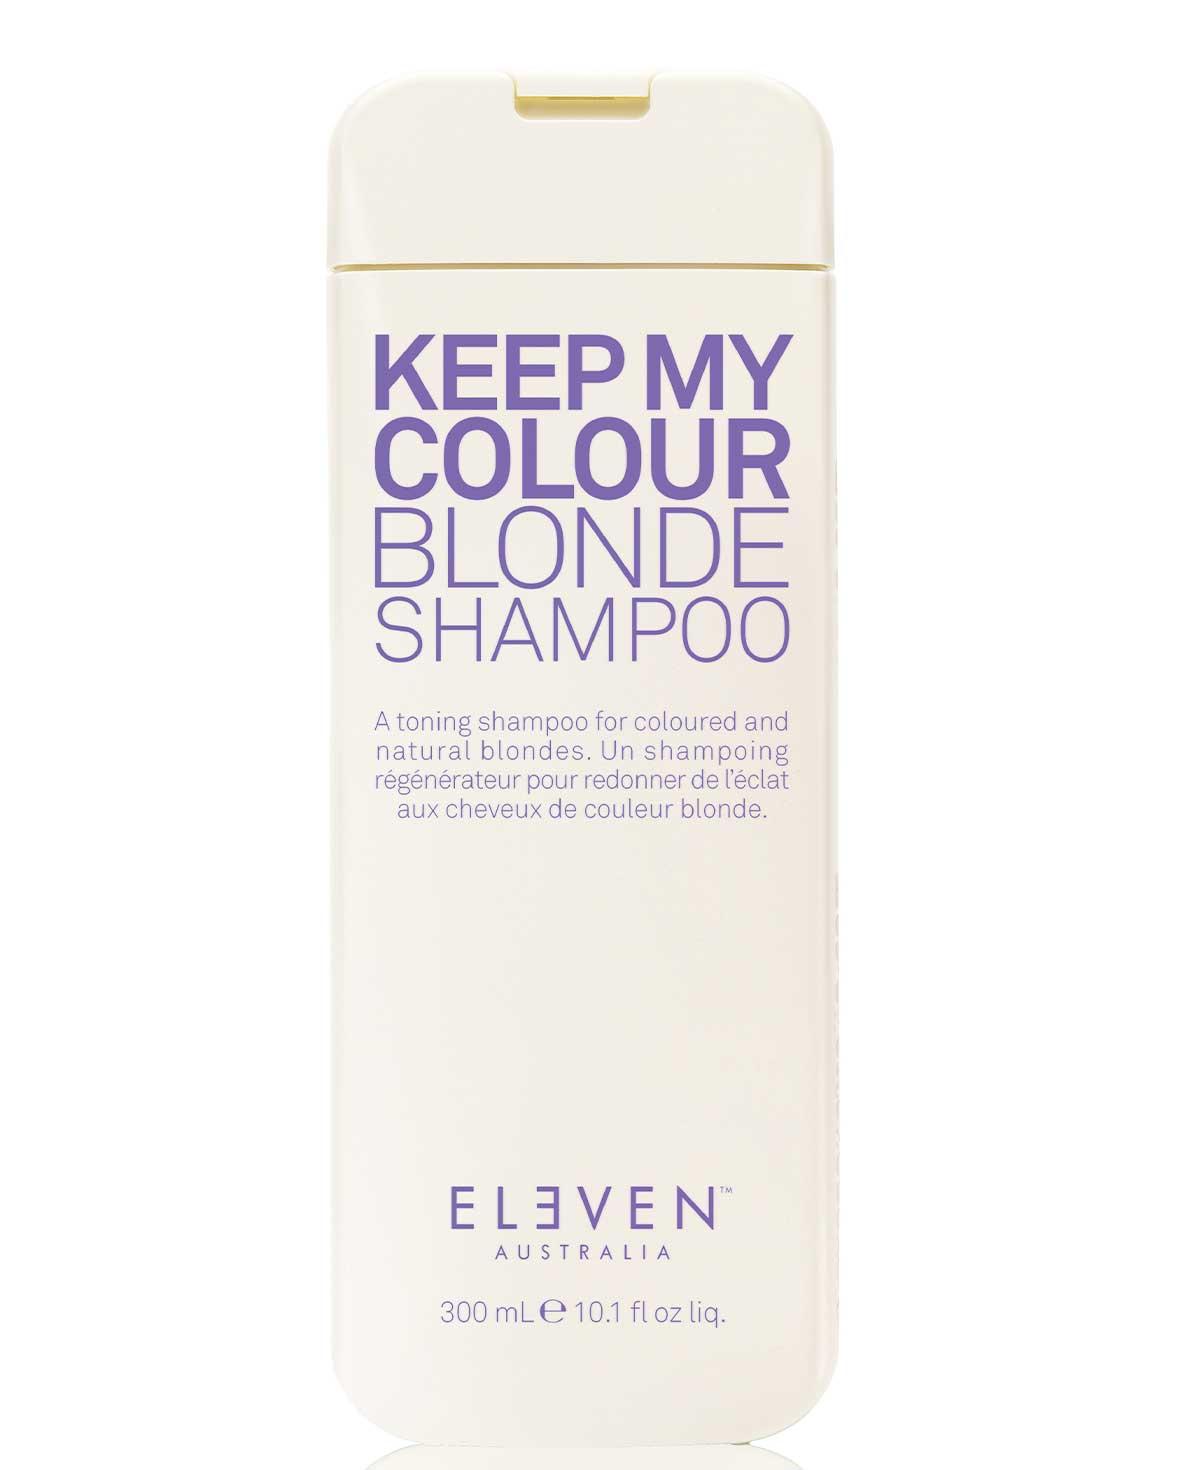 Eleven Keep My Blonde Shampoo 300ml